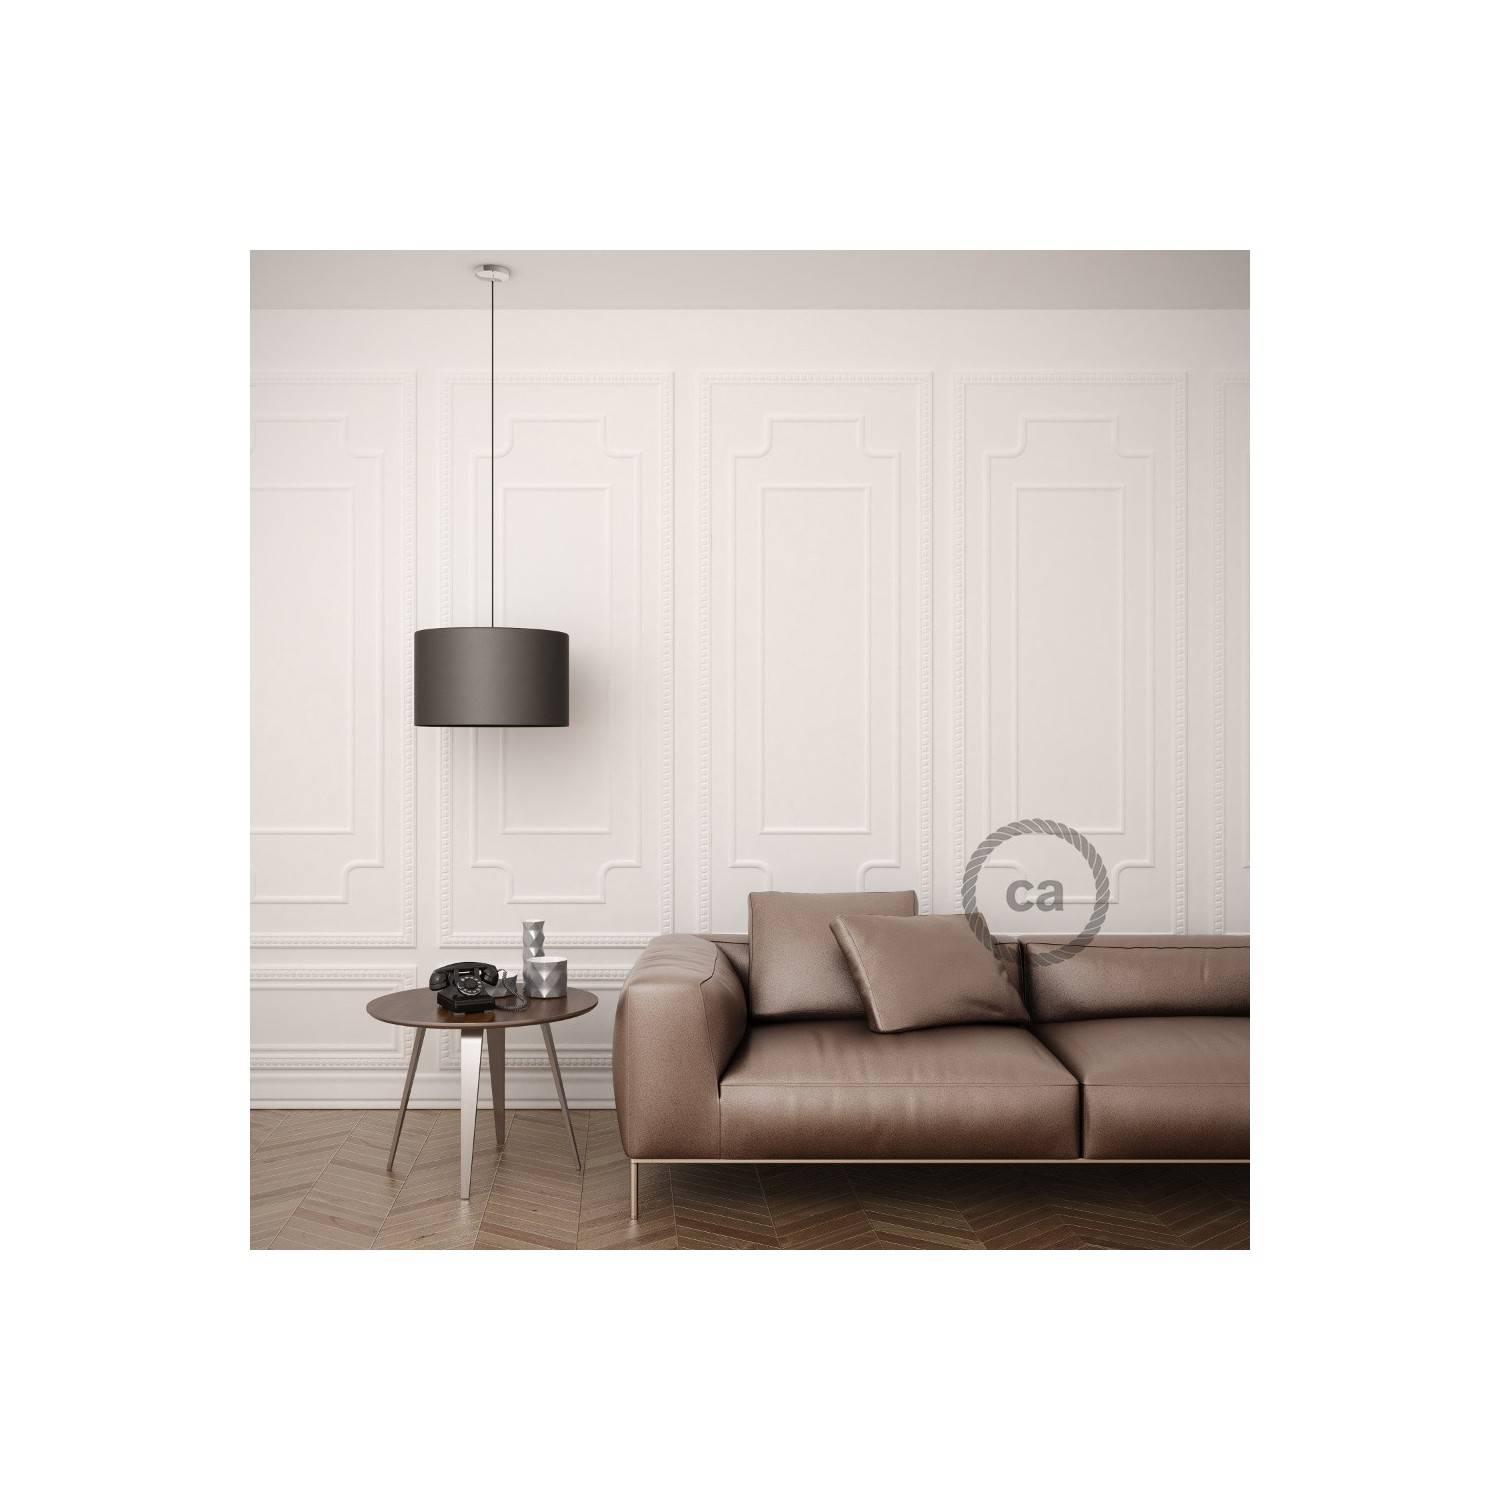 Pendel per paralume, lampada sospensione cavo tessile Effetto Seta Marrone RM13